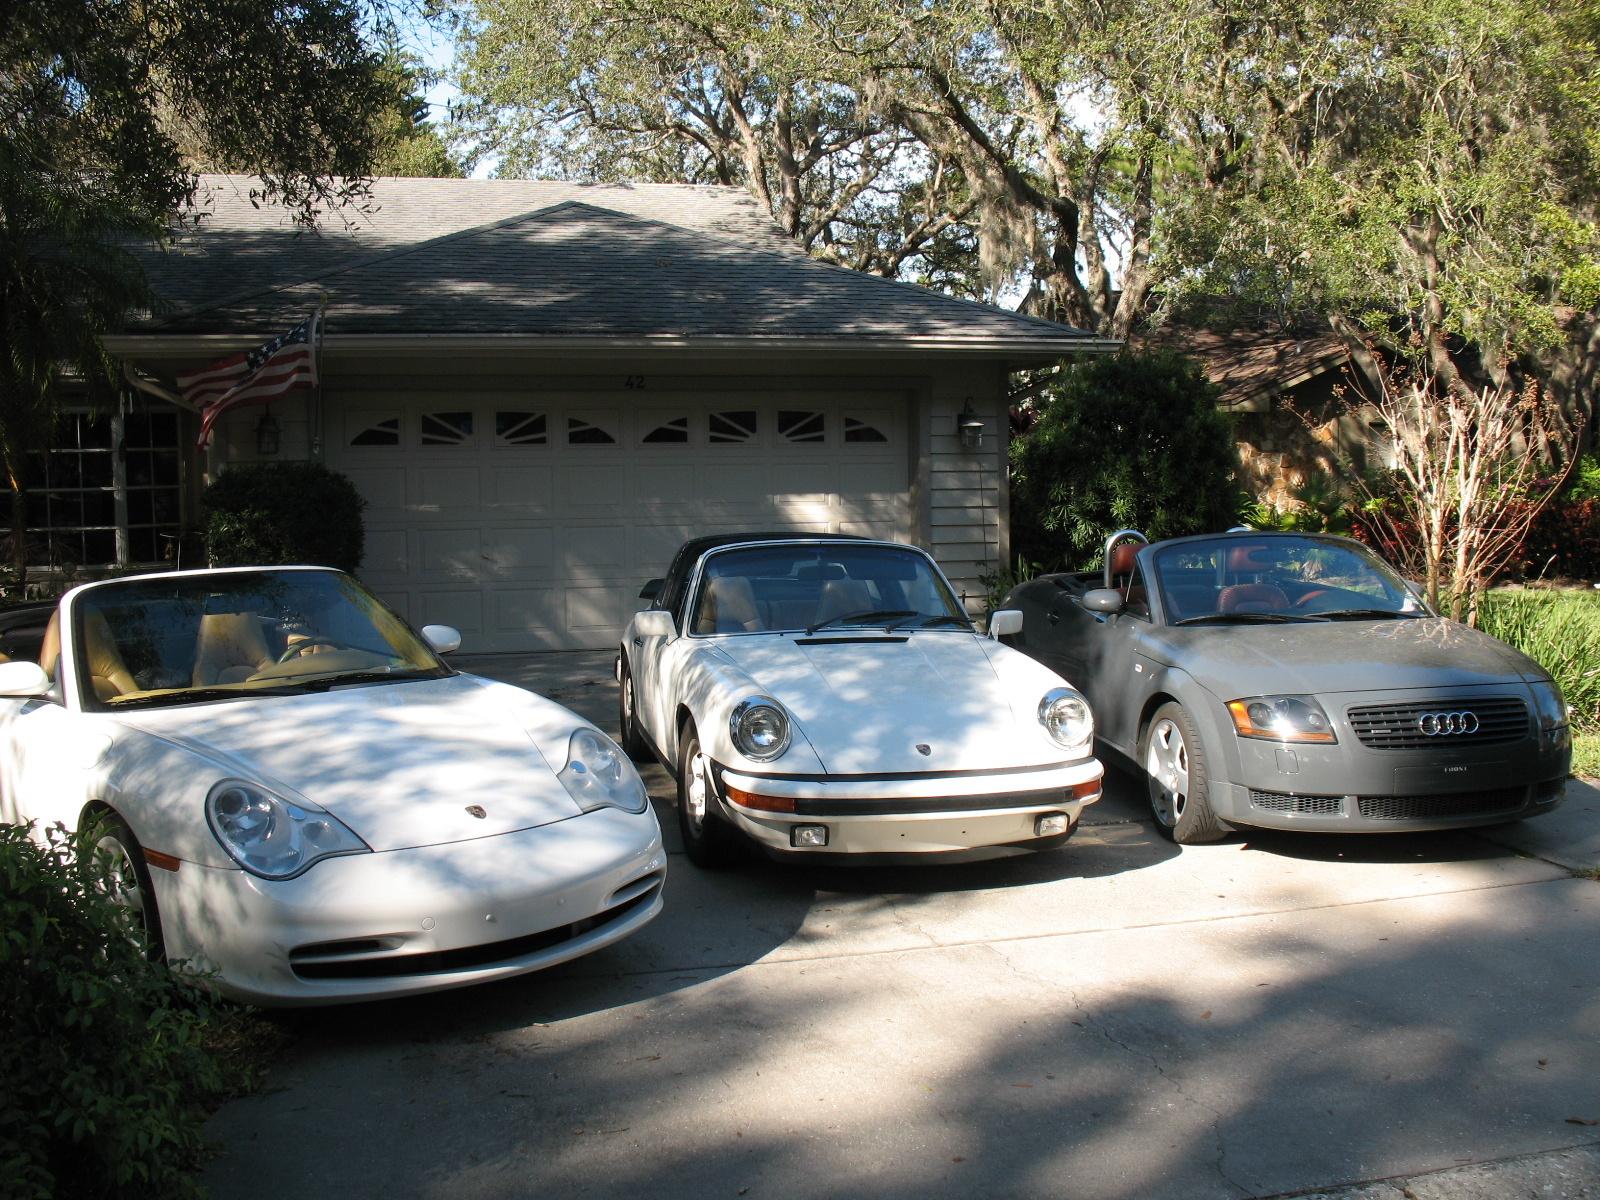 Porsche boxster ims failure rate